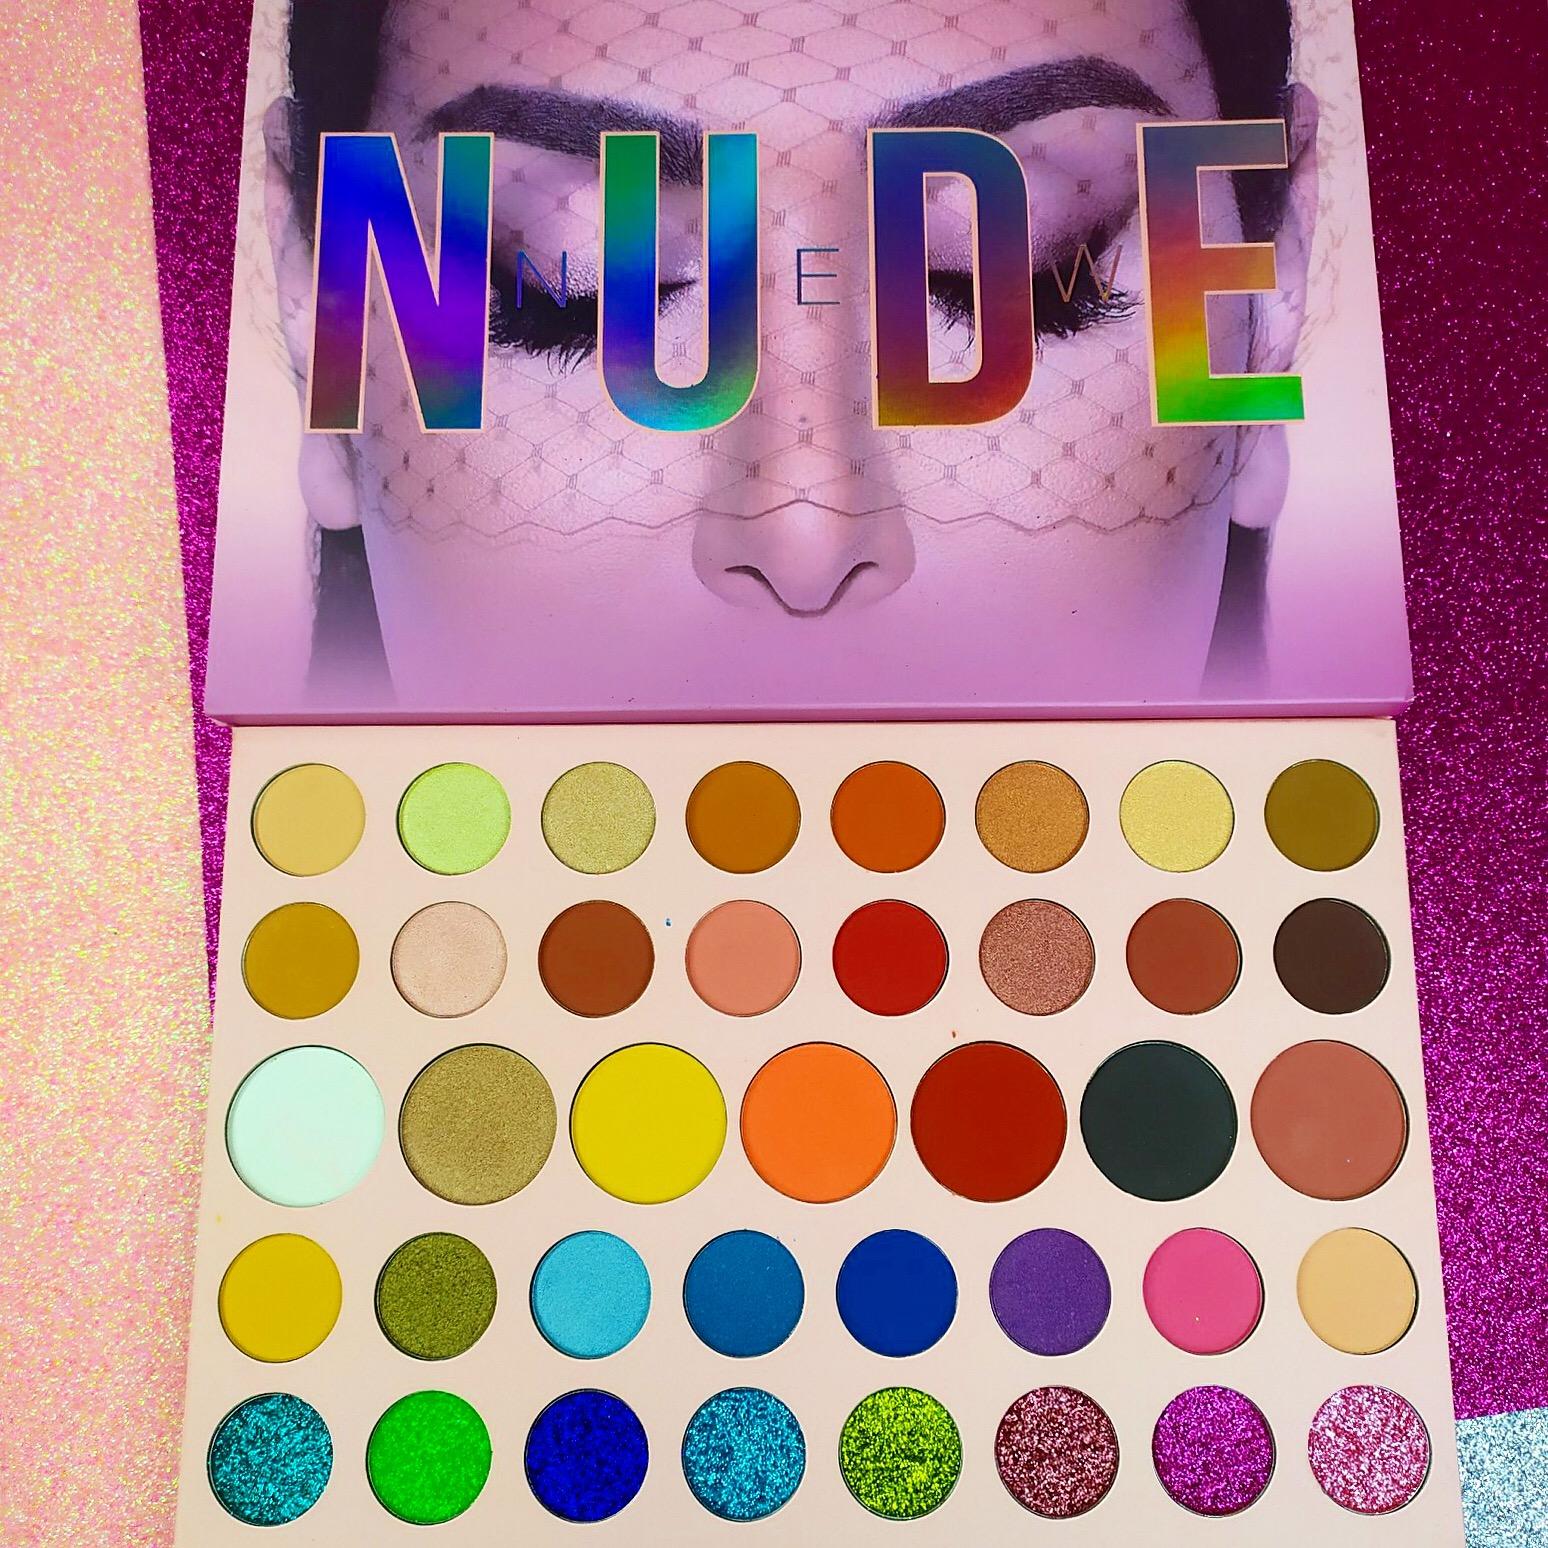 Paleta de sombras Jumbo Naked 4 fashionable Generous - Joi Boutique